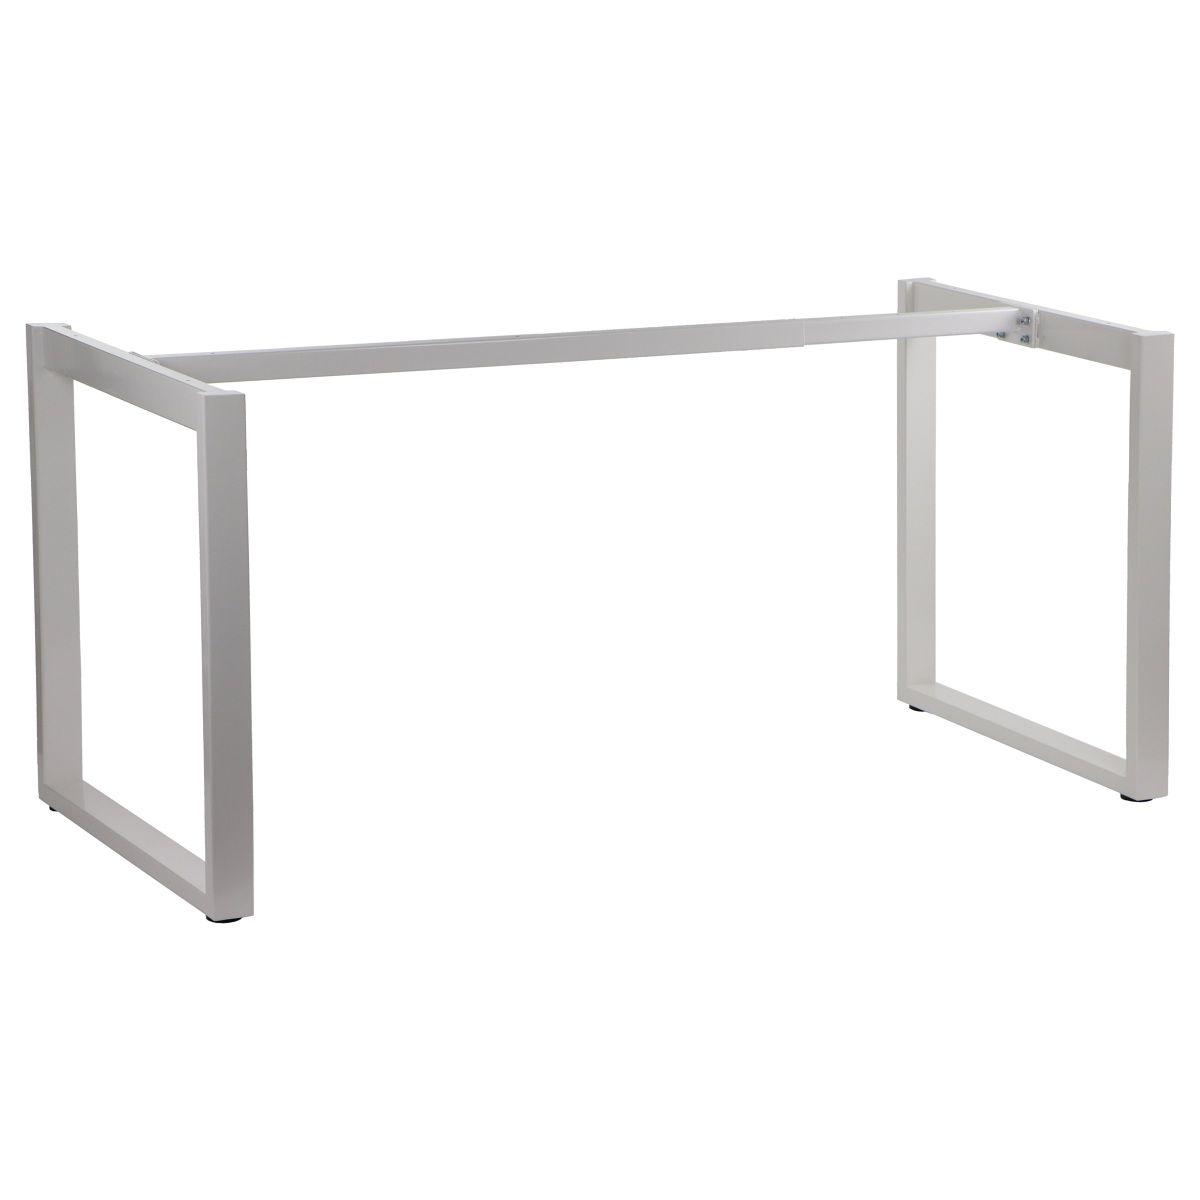 Stelaż skręcany do stołu i biurka EF-NY-131A/70 biały